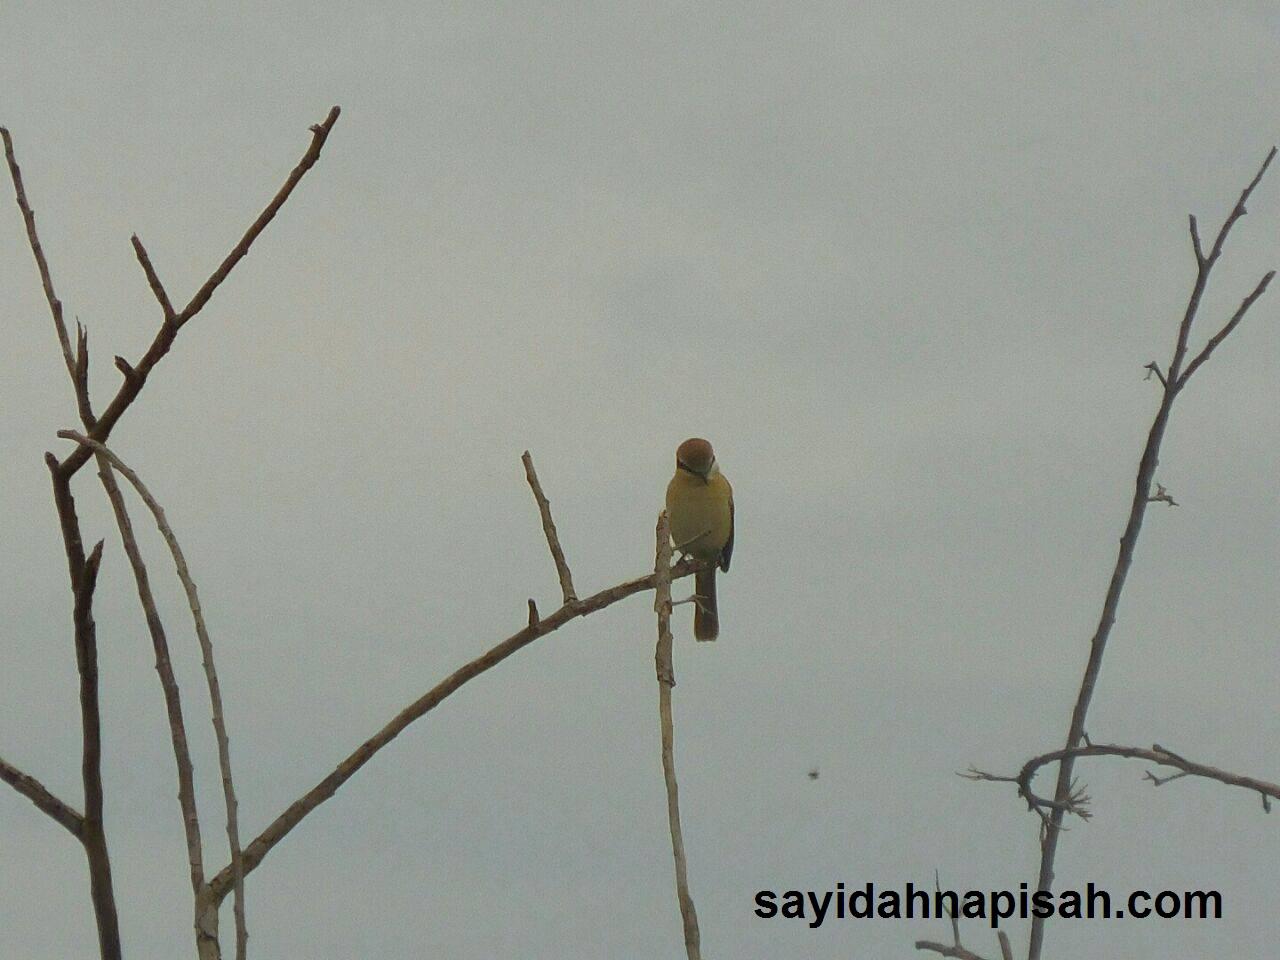 burung cantik selalu singgah belakang rumah